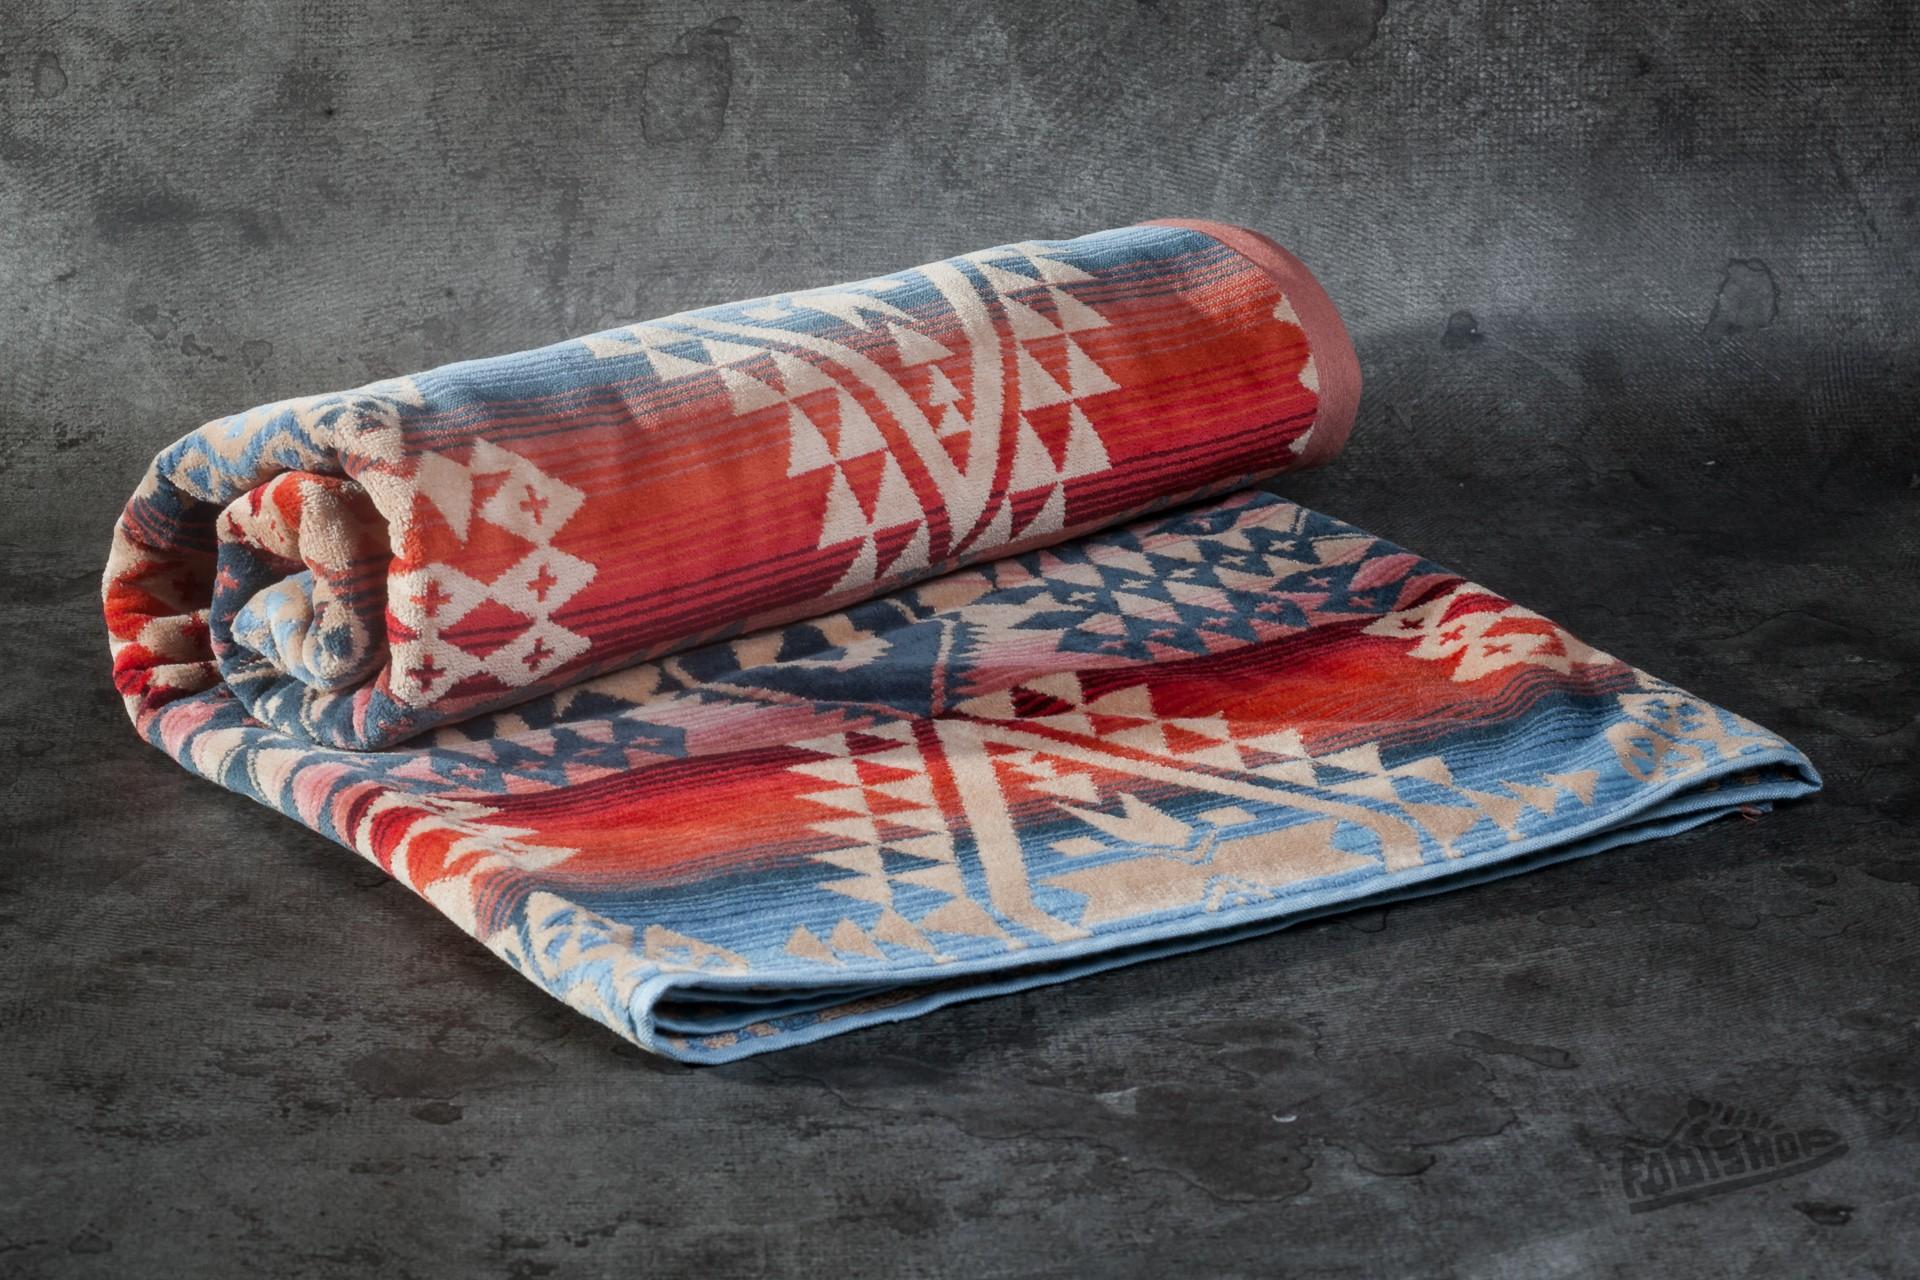 Pendleton Desert Sky (Canyonlands) Oversized Jacquard Towel - 9716